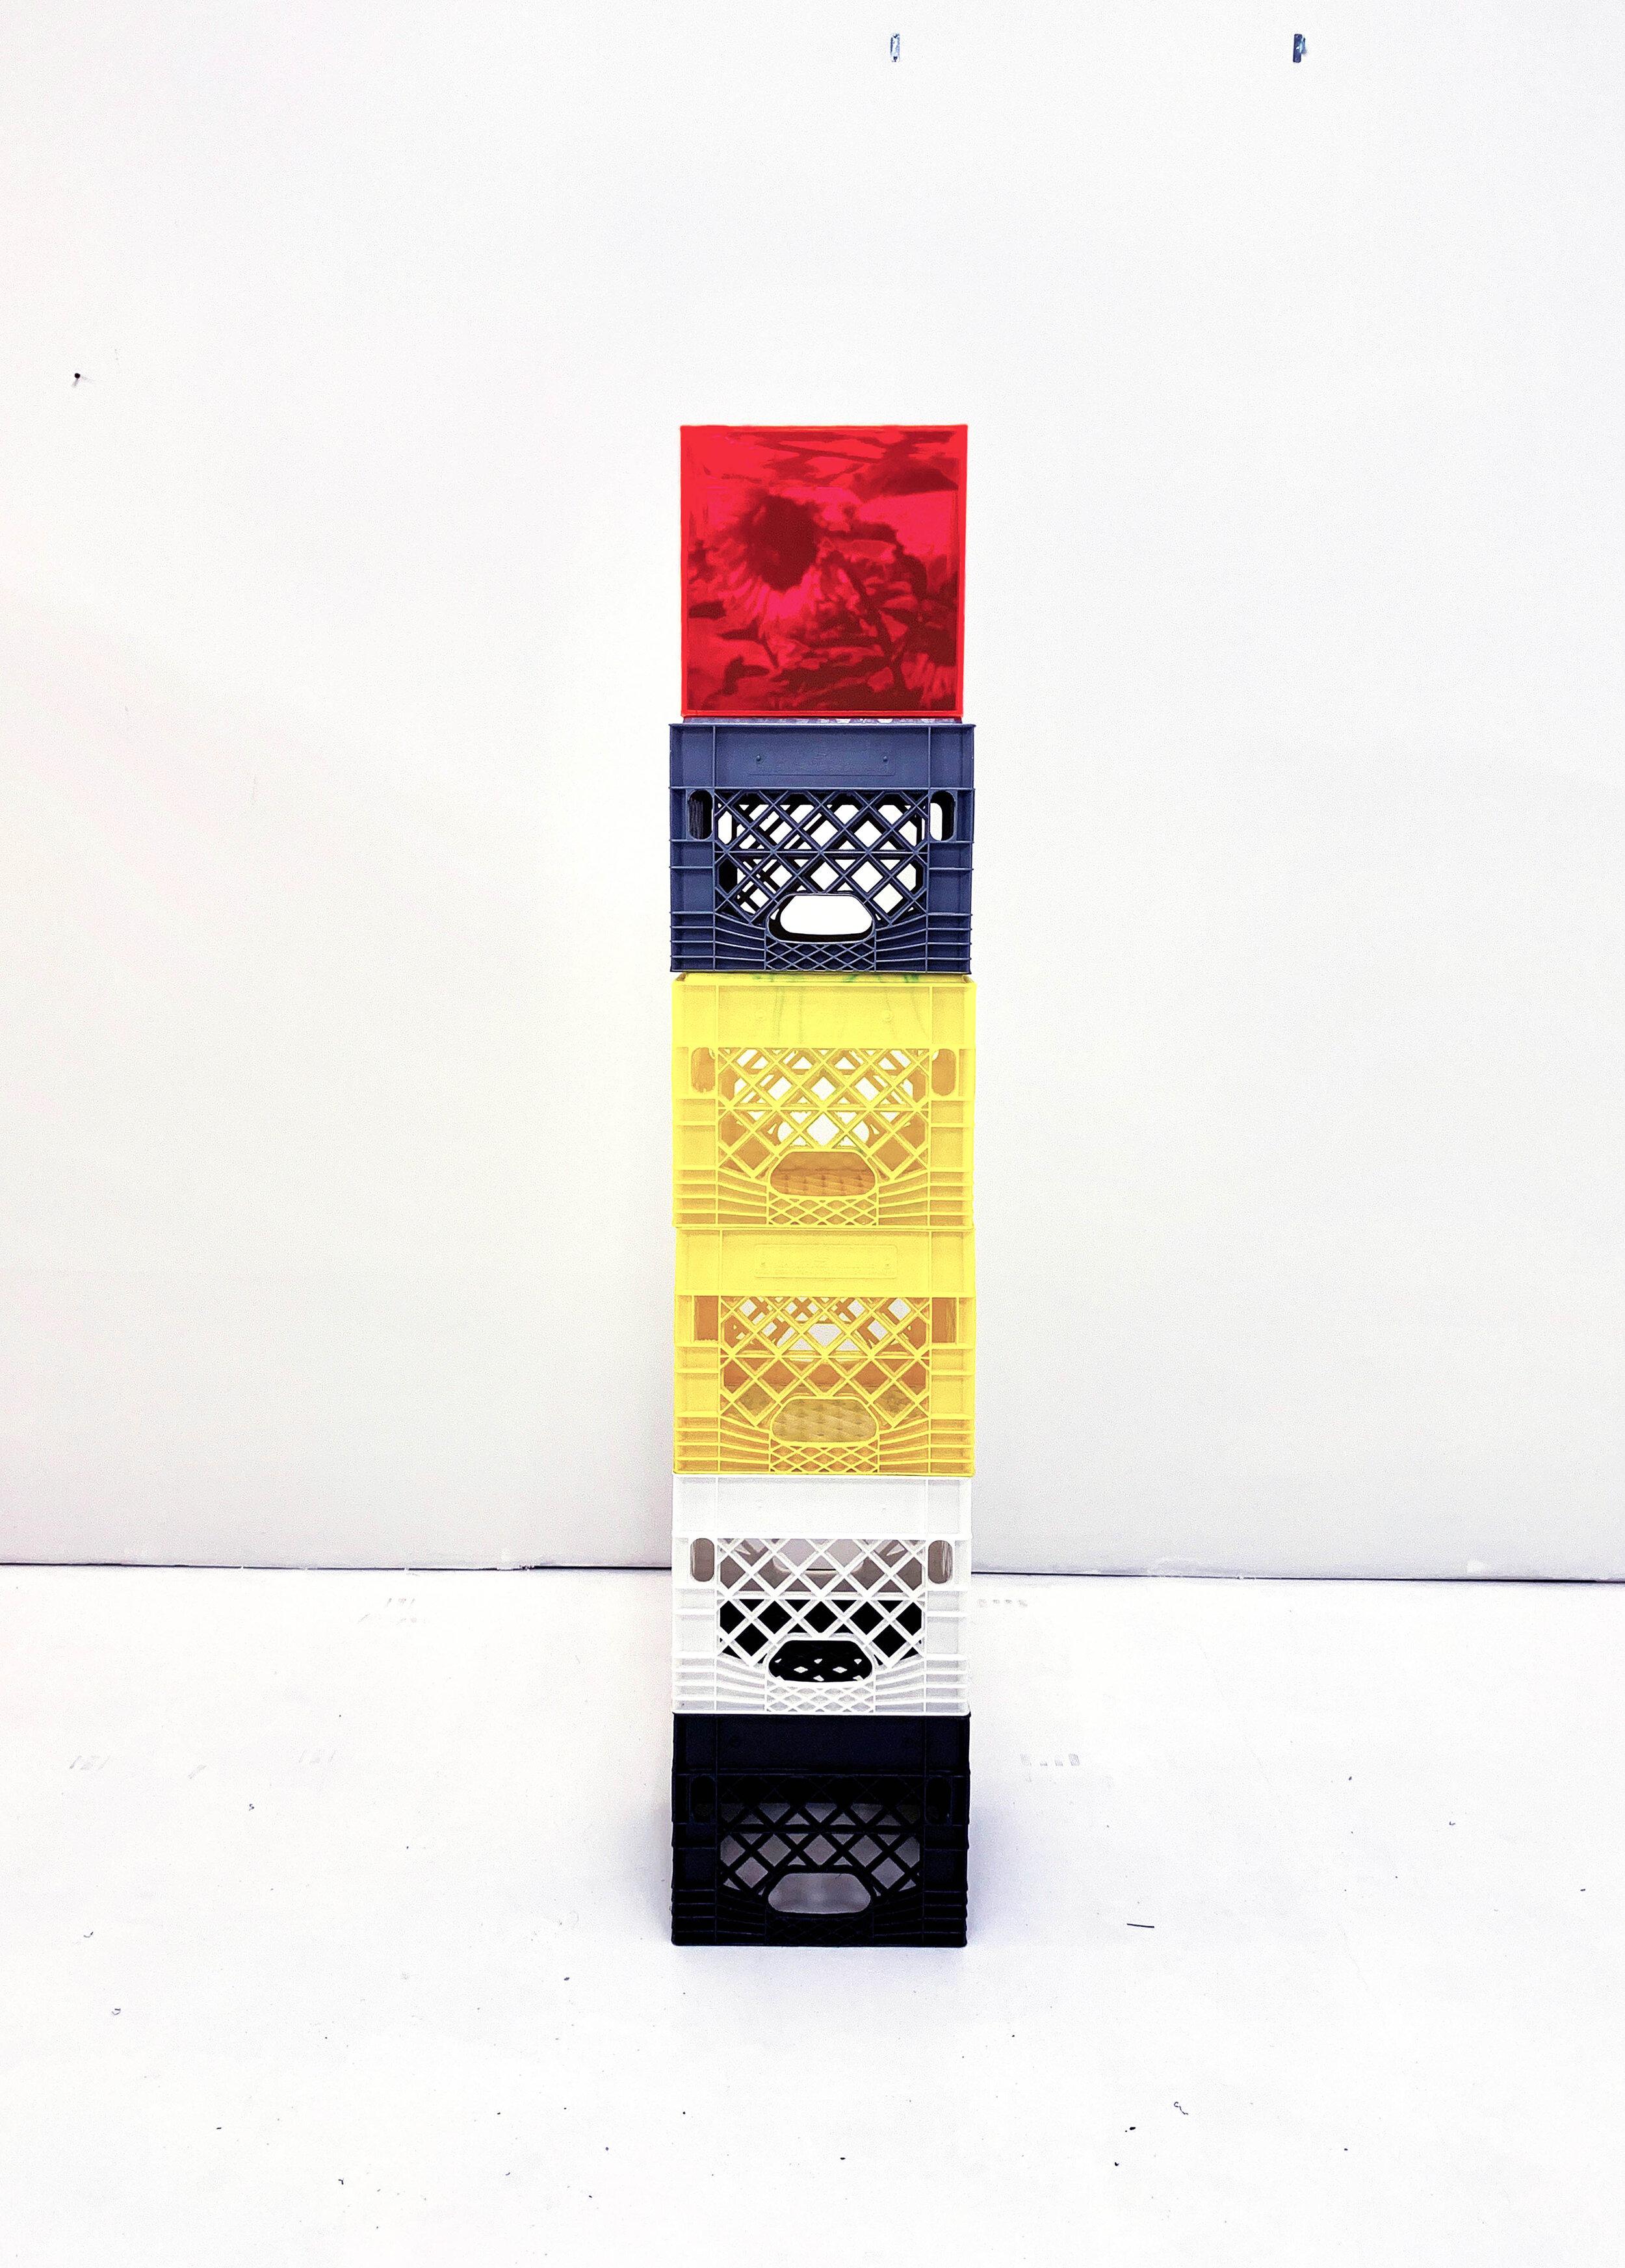 2_Bauer_Strawberry fields tower_2019_72inx12inx12in_UV ink cast acrylic plexiglass milkcrates.jpg